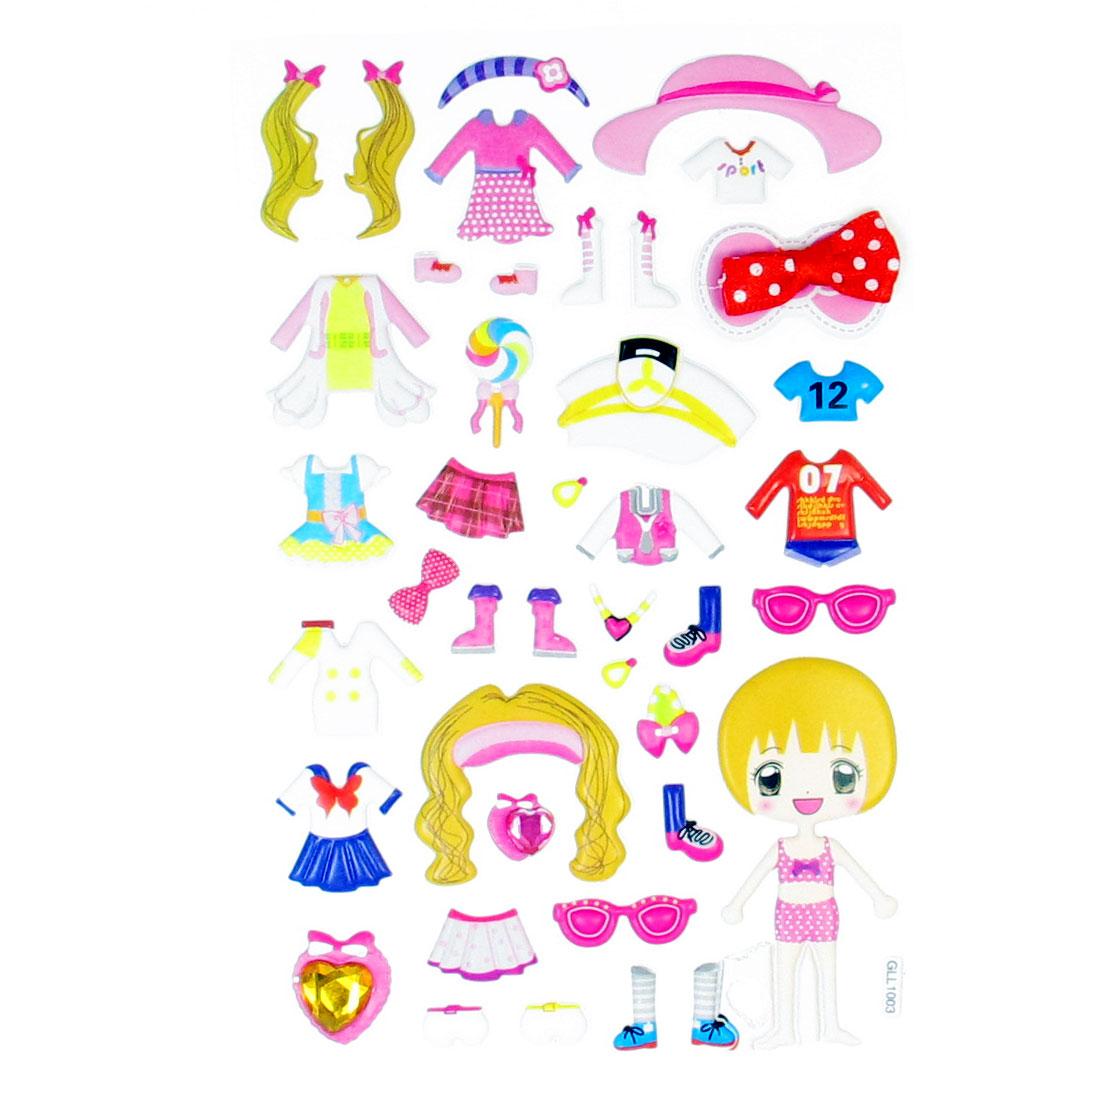 Bedroom Wall Decor Girls Pet Skirts Pattern 3D Puffy Sticker